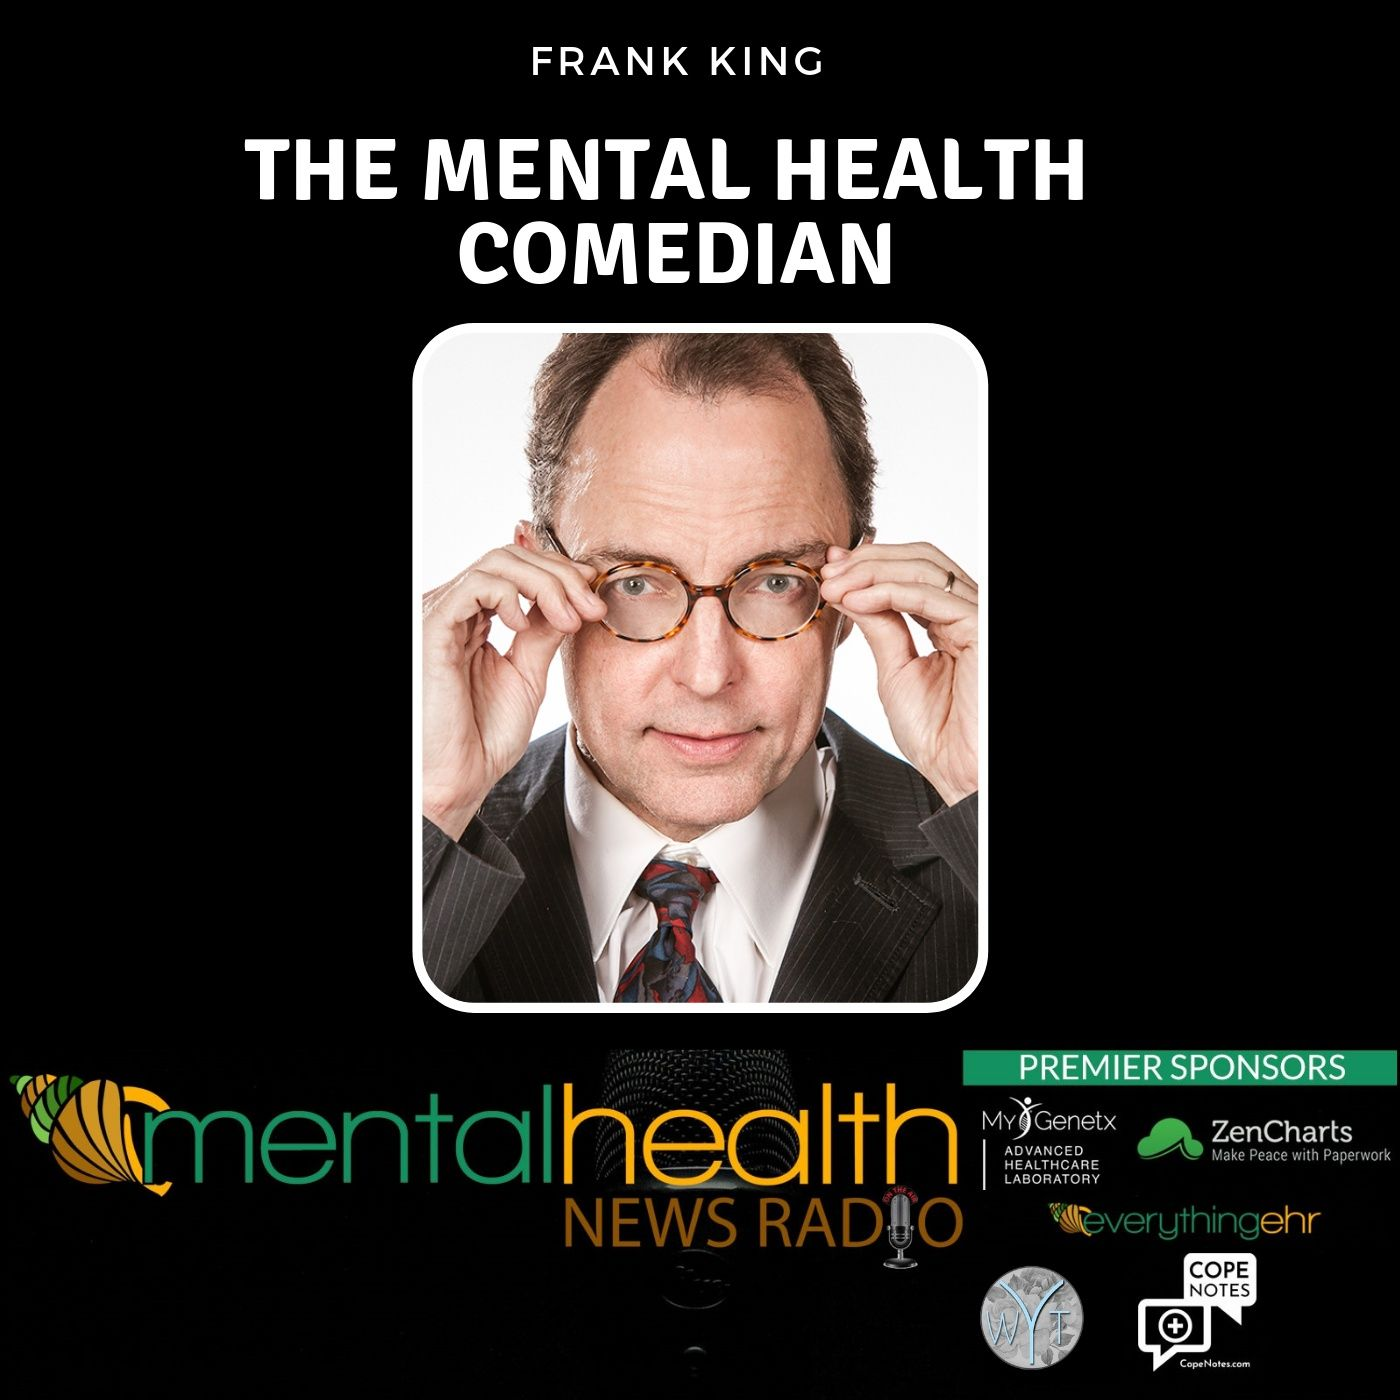 Mental Health News Radio - The Mental Health Comedian: Frank King